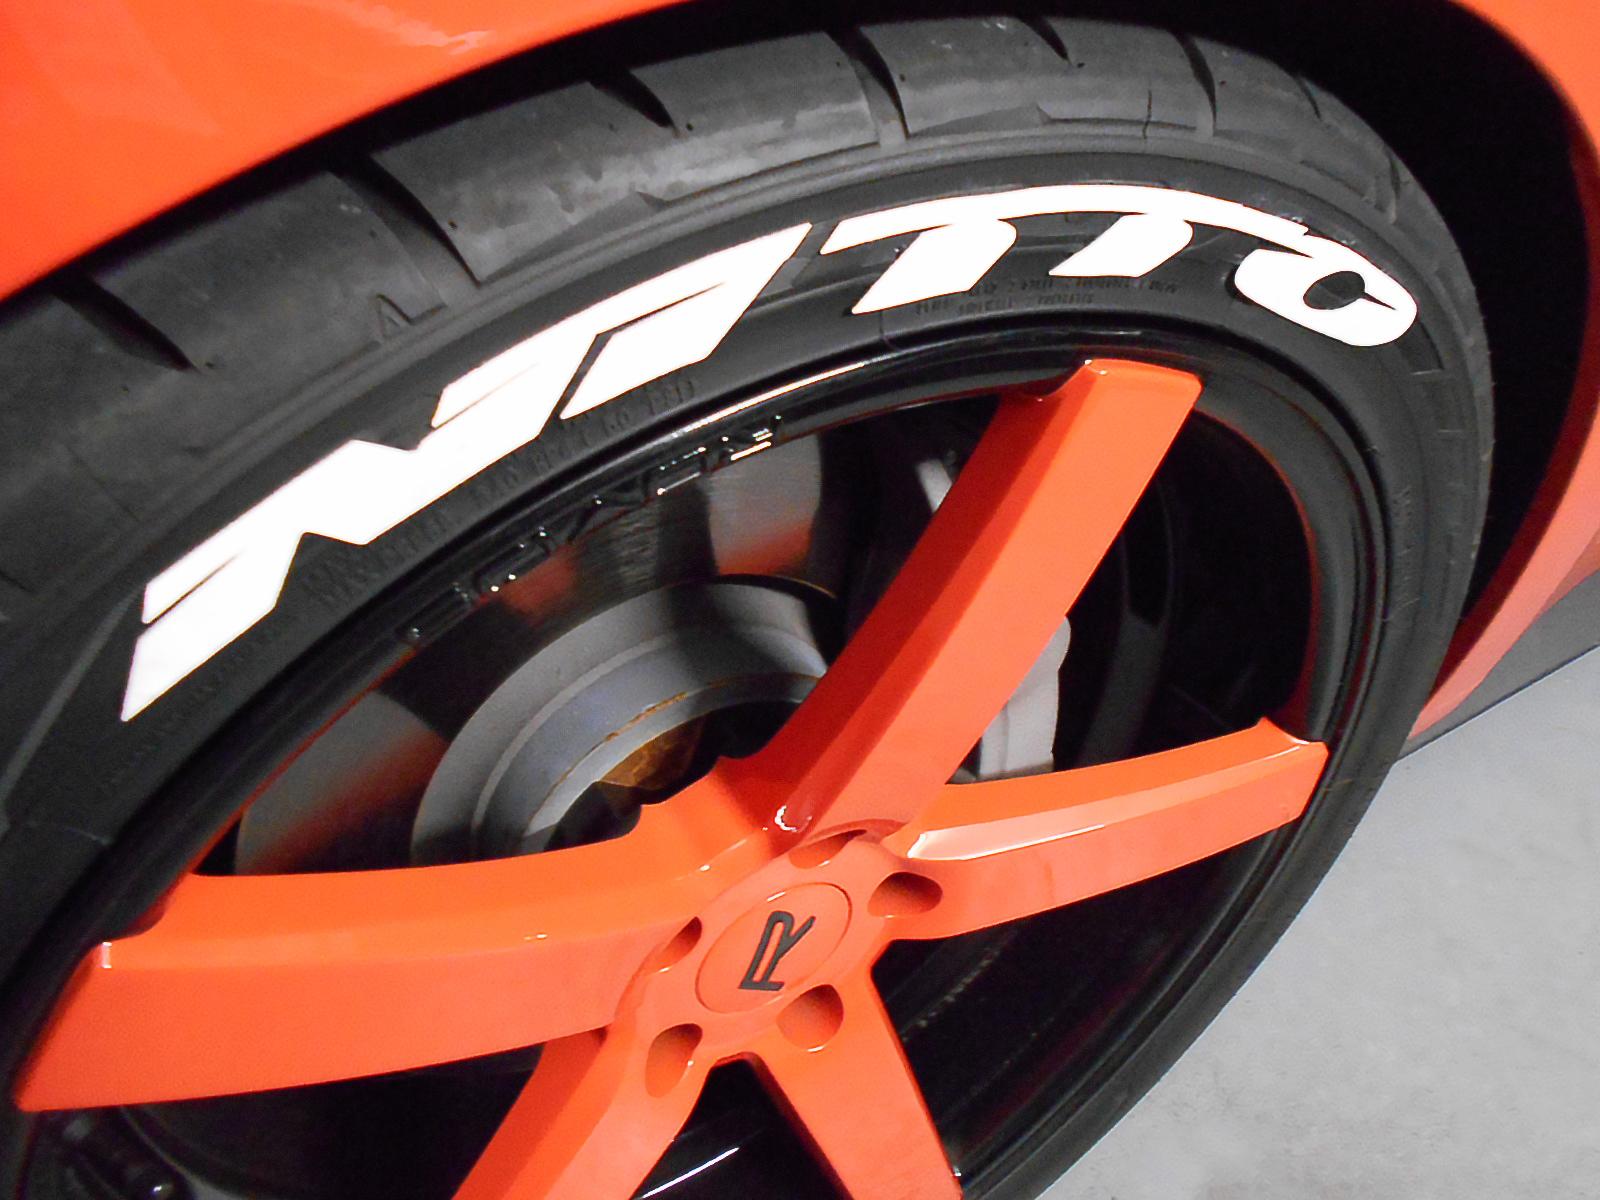 Treadwear graphics on tire close up